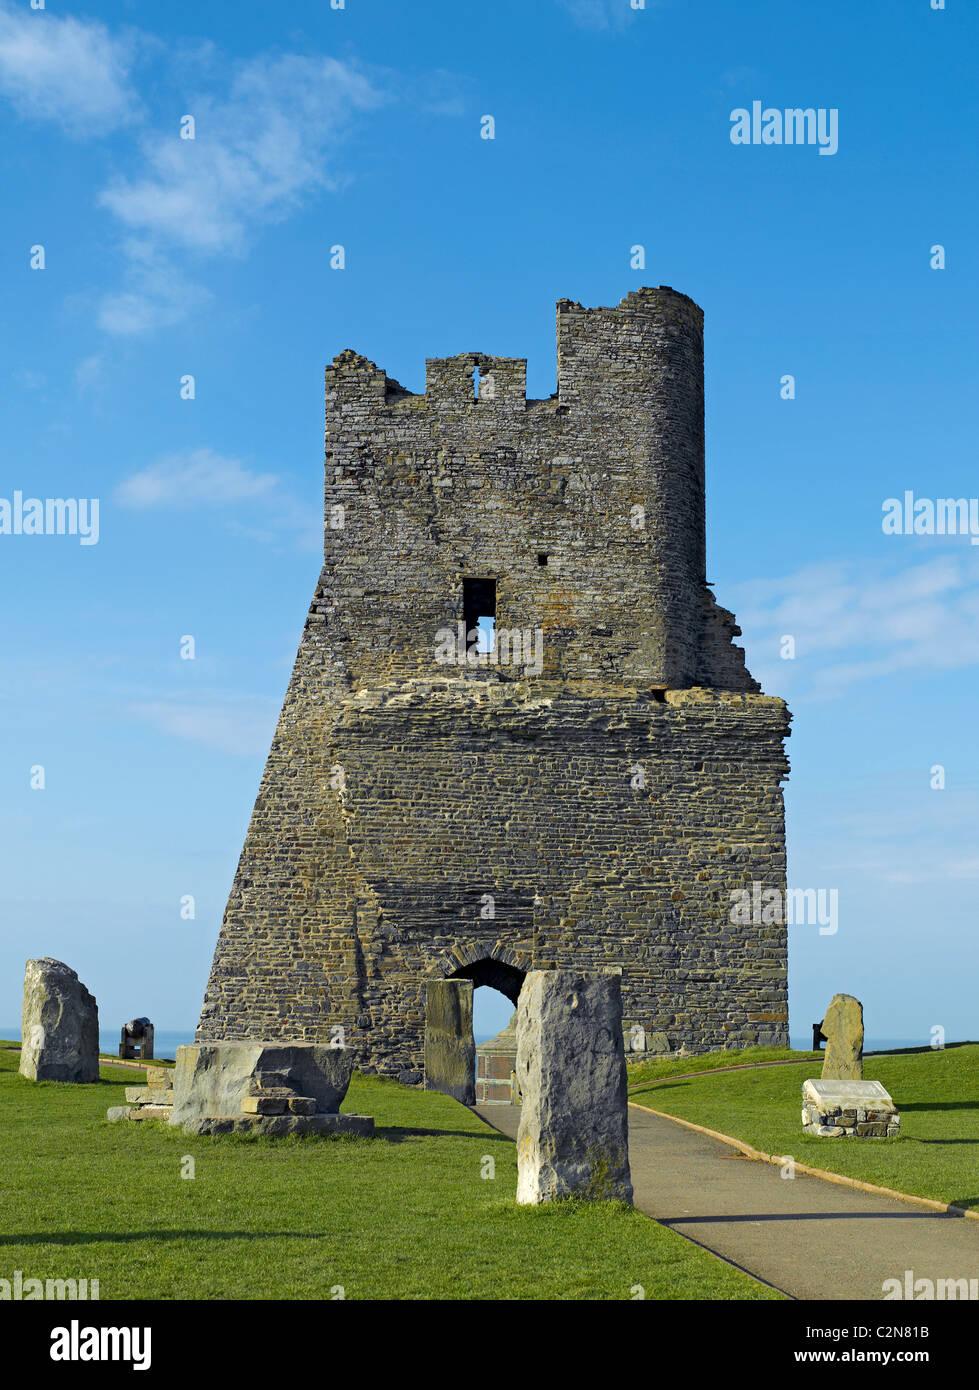 Ruins of Aberystwyth Castle Cardiganshire mid Wales UK United Kingdom GB Great Britain - Stock Image